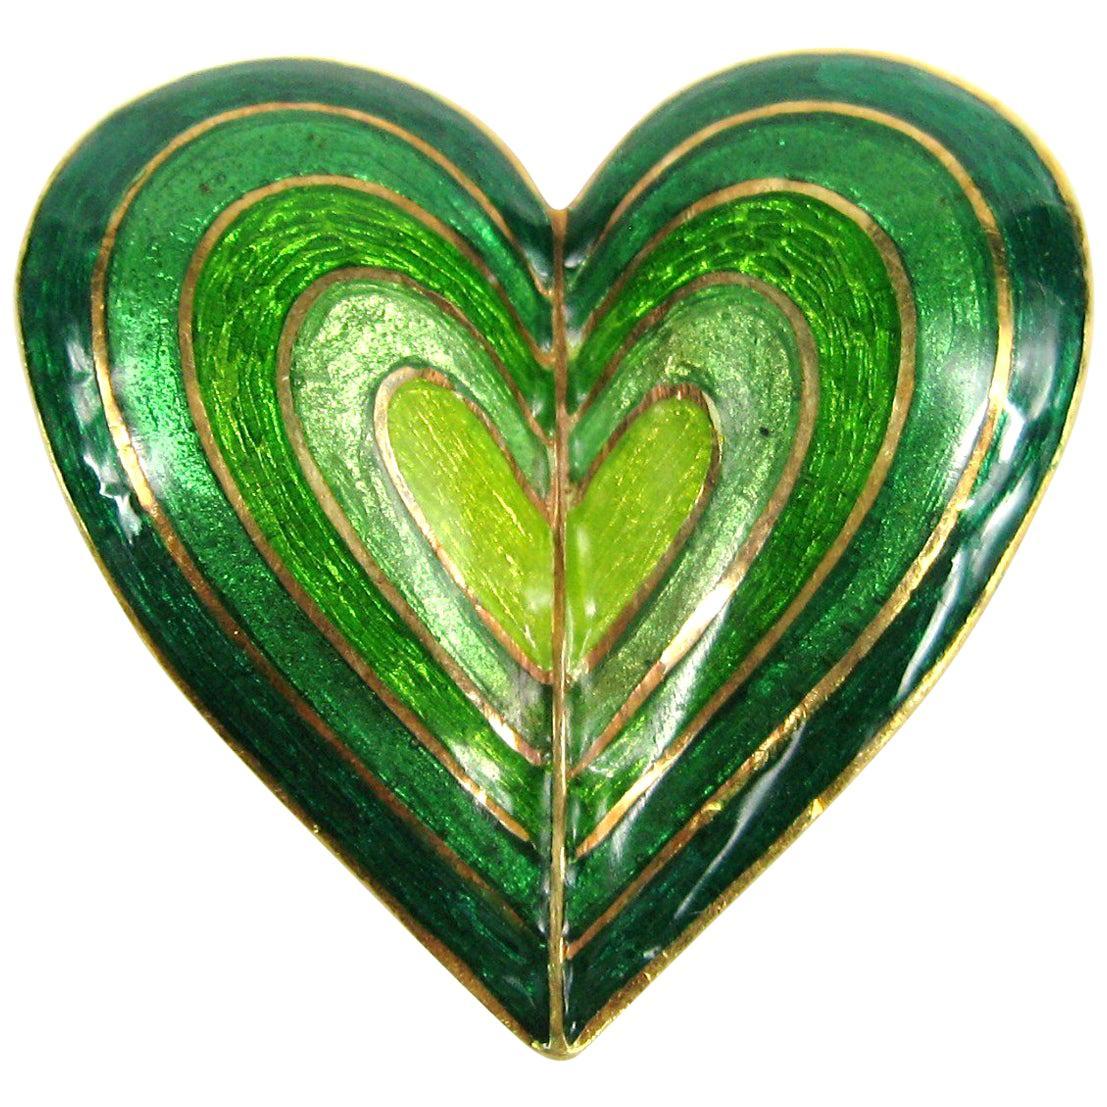 Tiffany & Co. Green Ombre Enamel 18 Karat Gold Brooch Pendant